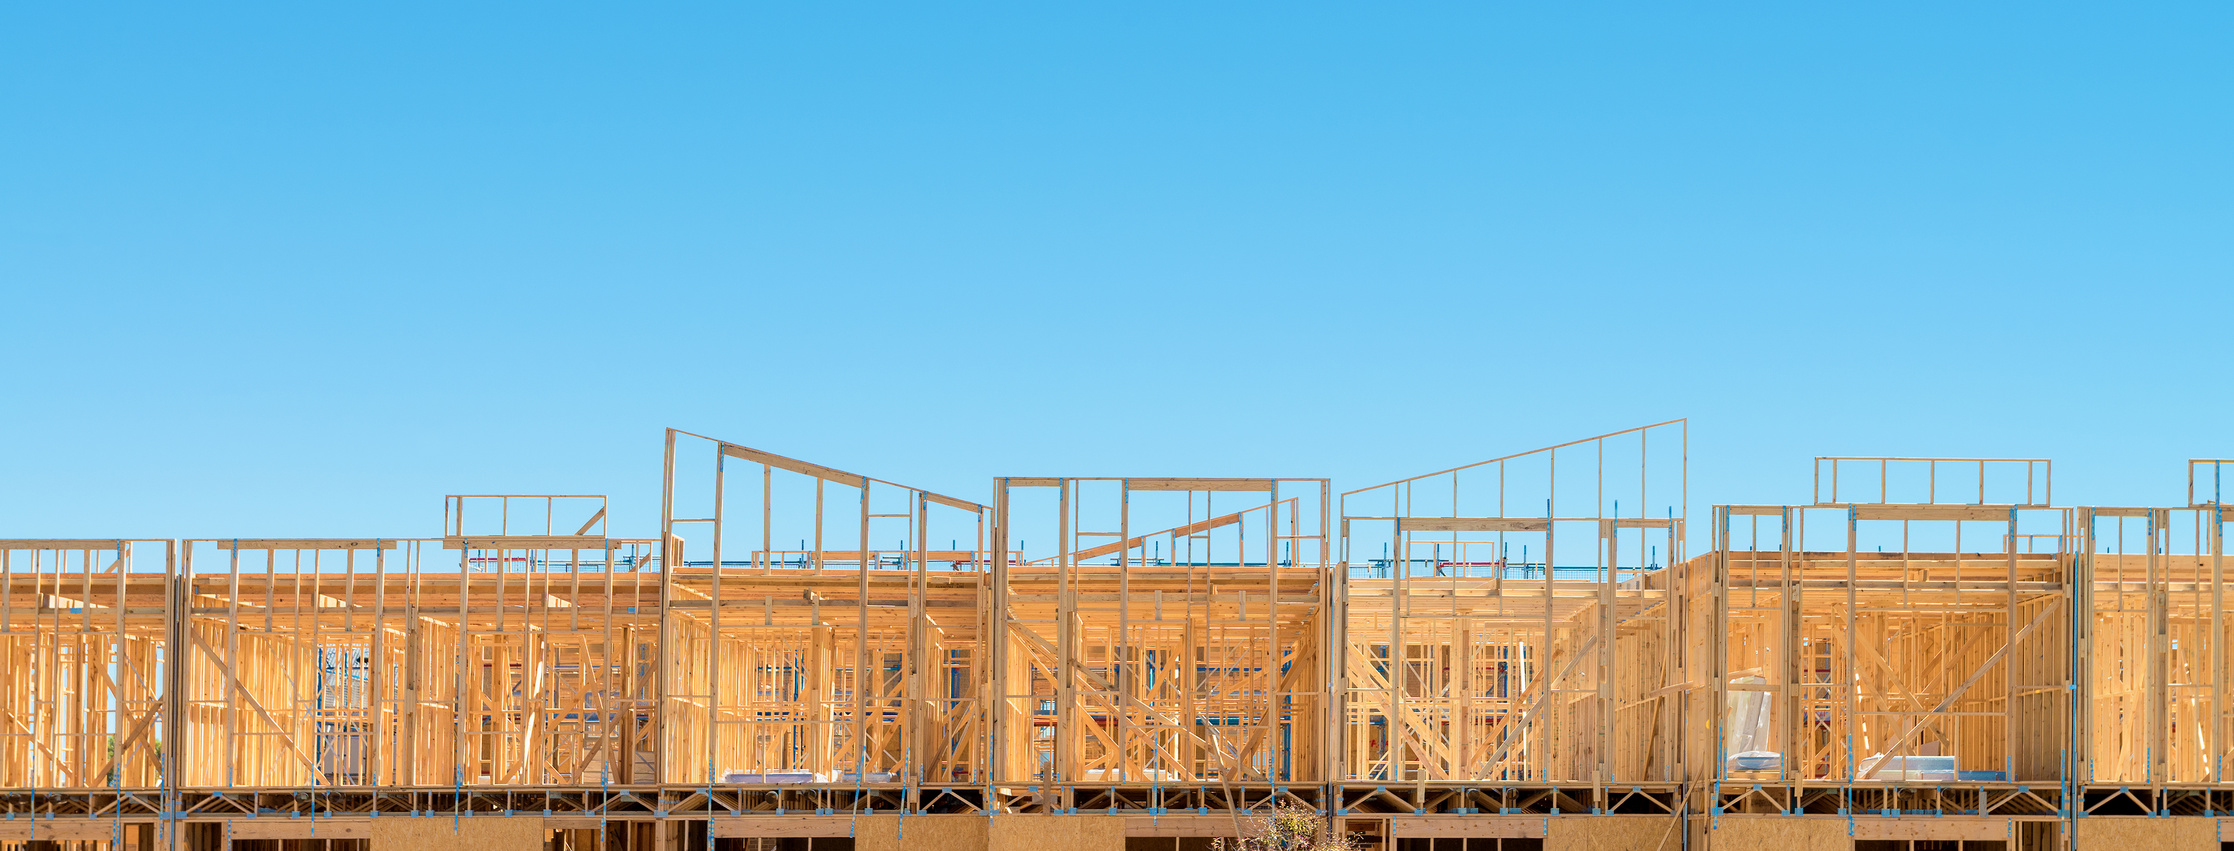 Fotolia_60558103_residential construction _M